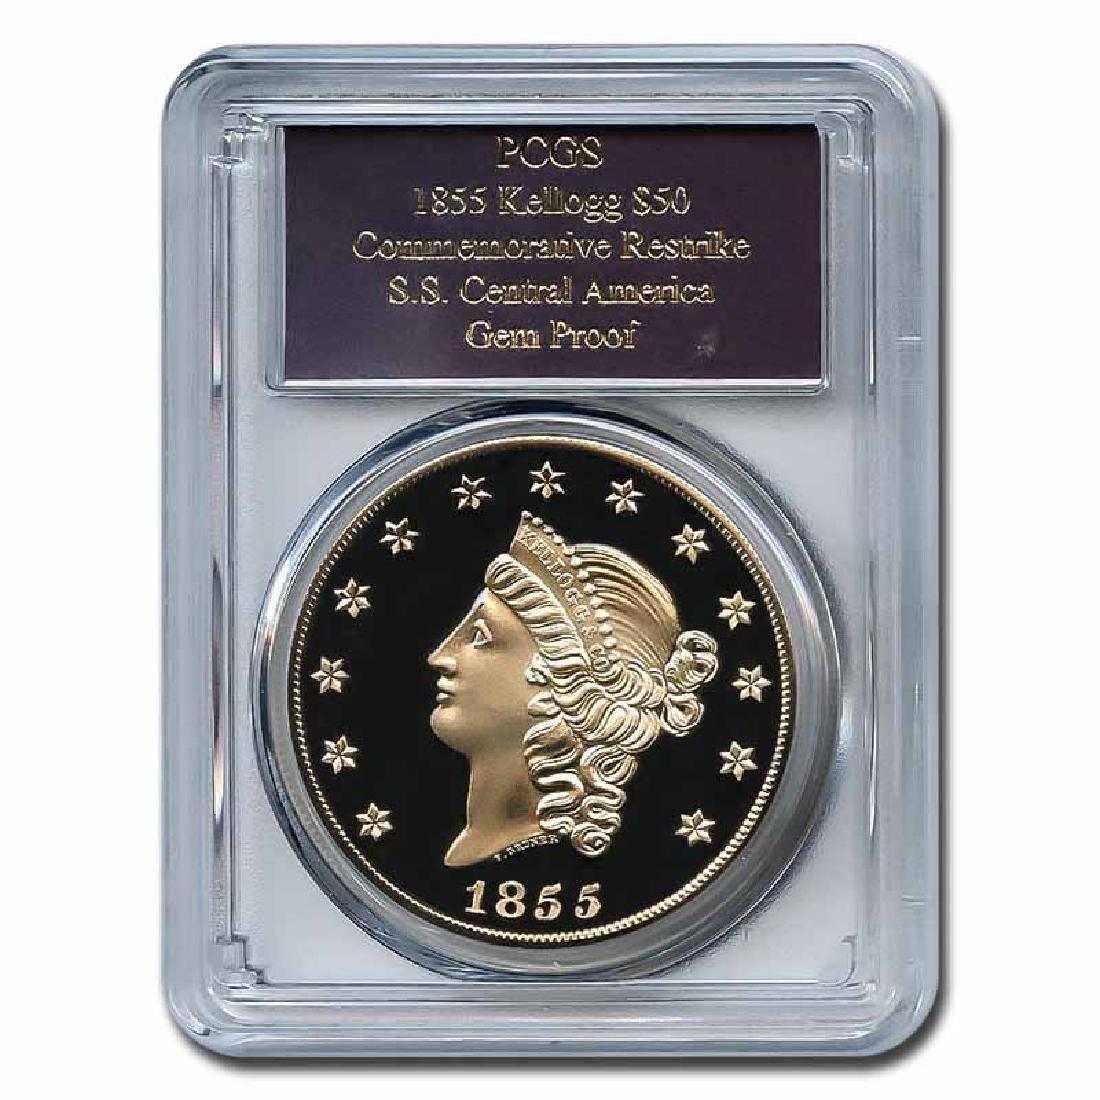 Certified Commemorative $50 Gold 1855 Kellogg Restrike